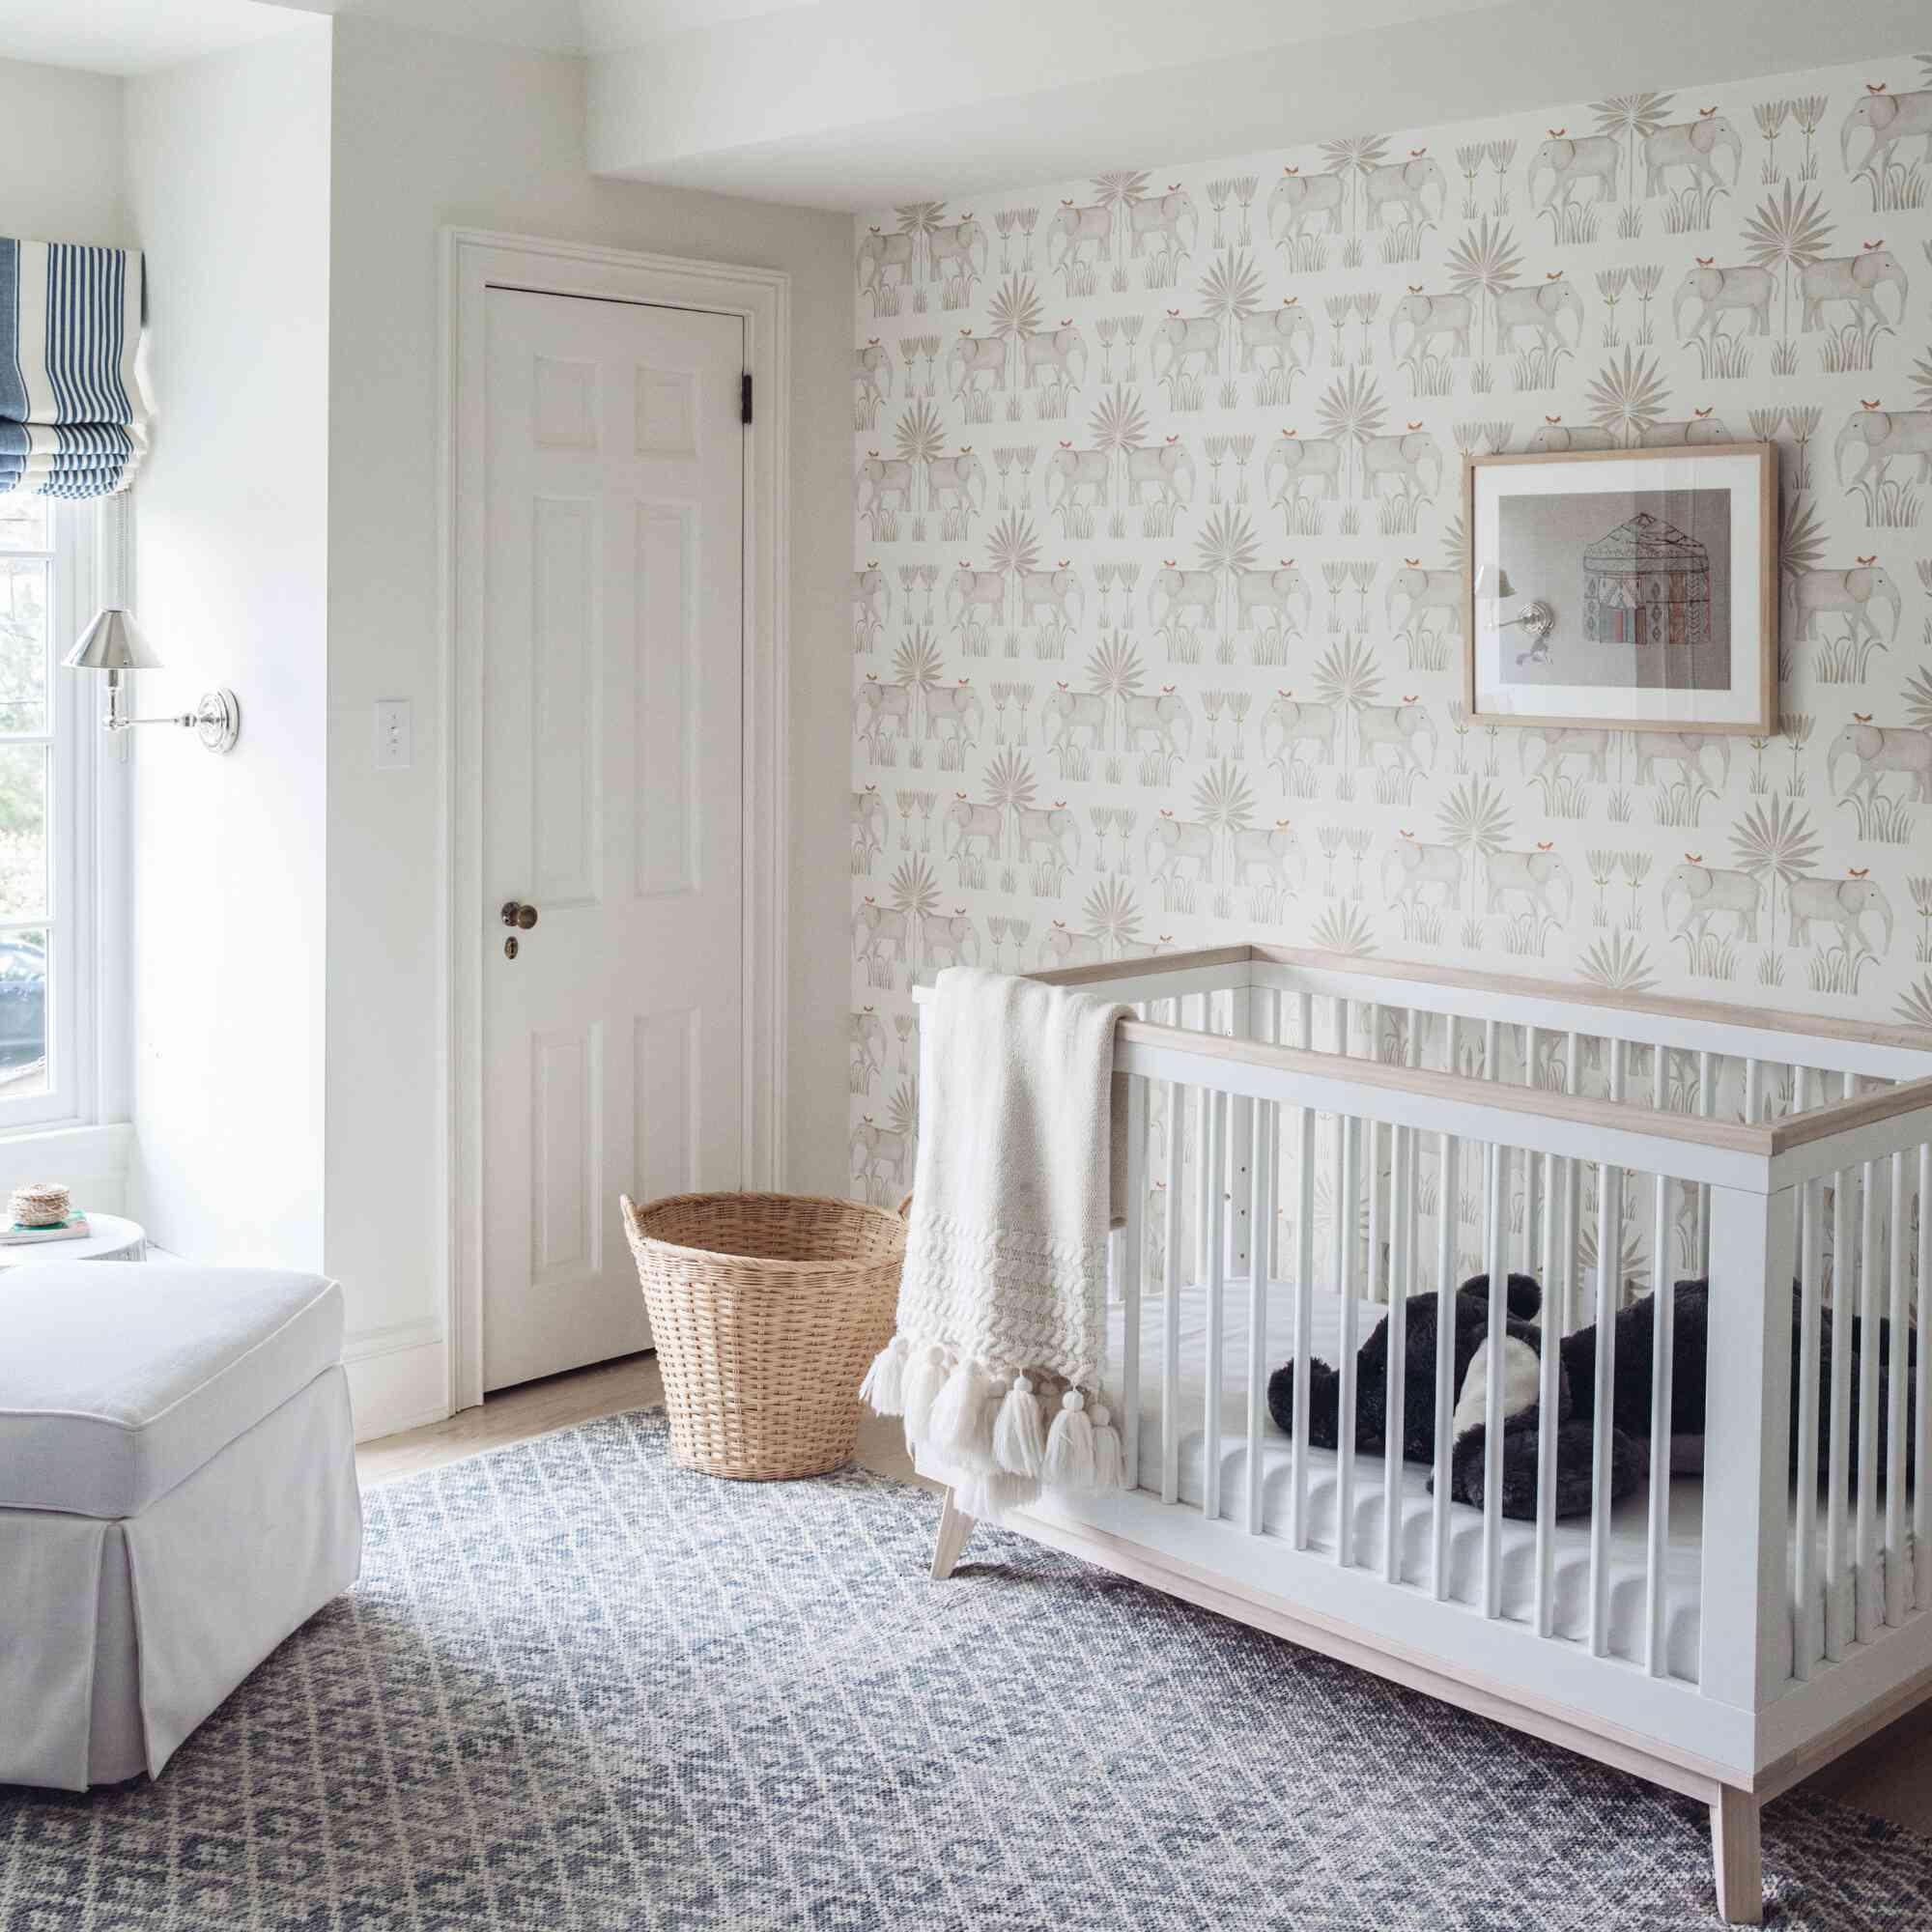 nursery with white color scheme, elephant print wallpaper, wicker basket between crib and closet door